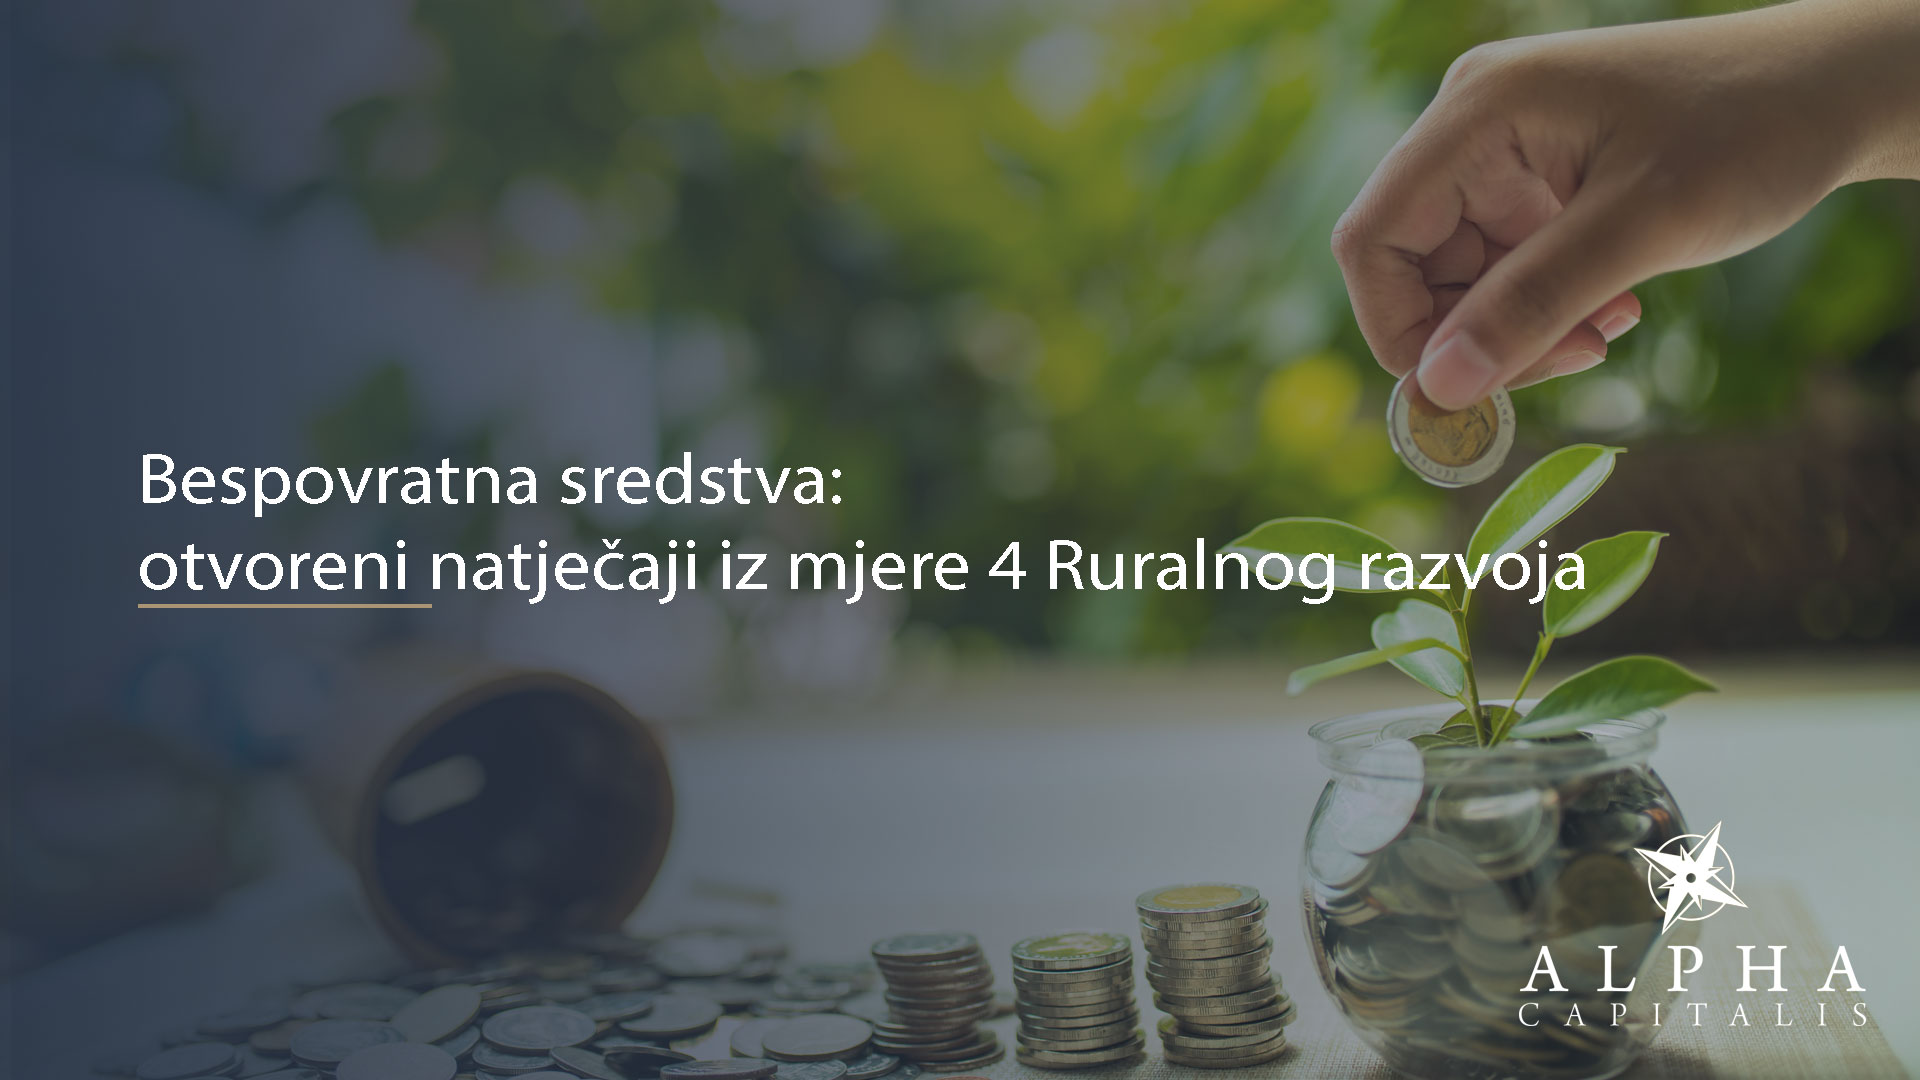 alpha-capitalis-EU-ruralni-razvoj